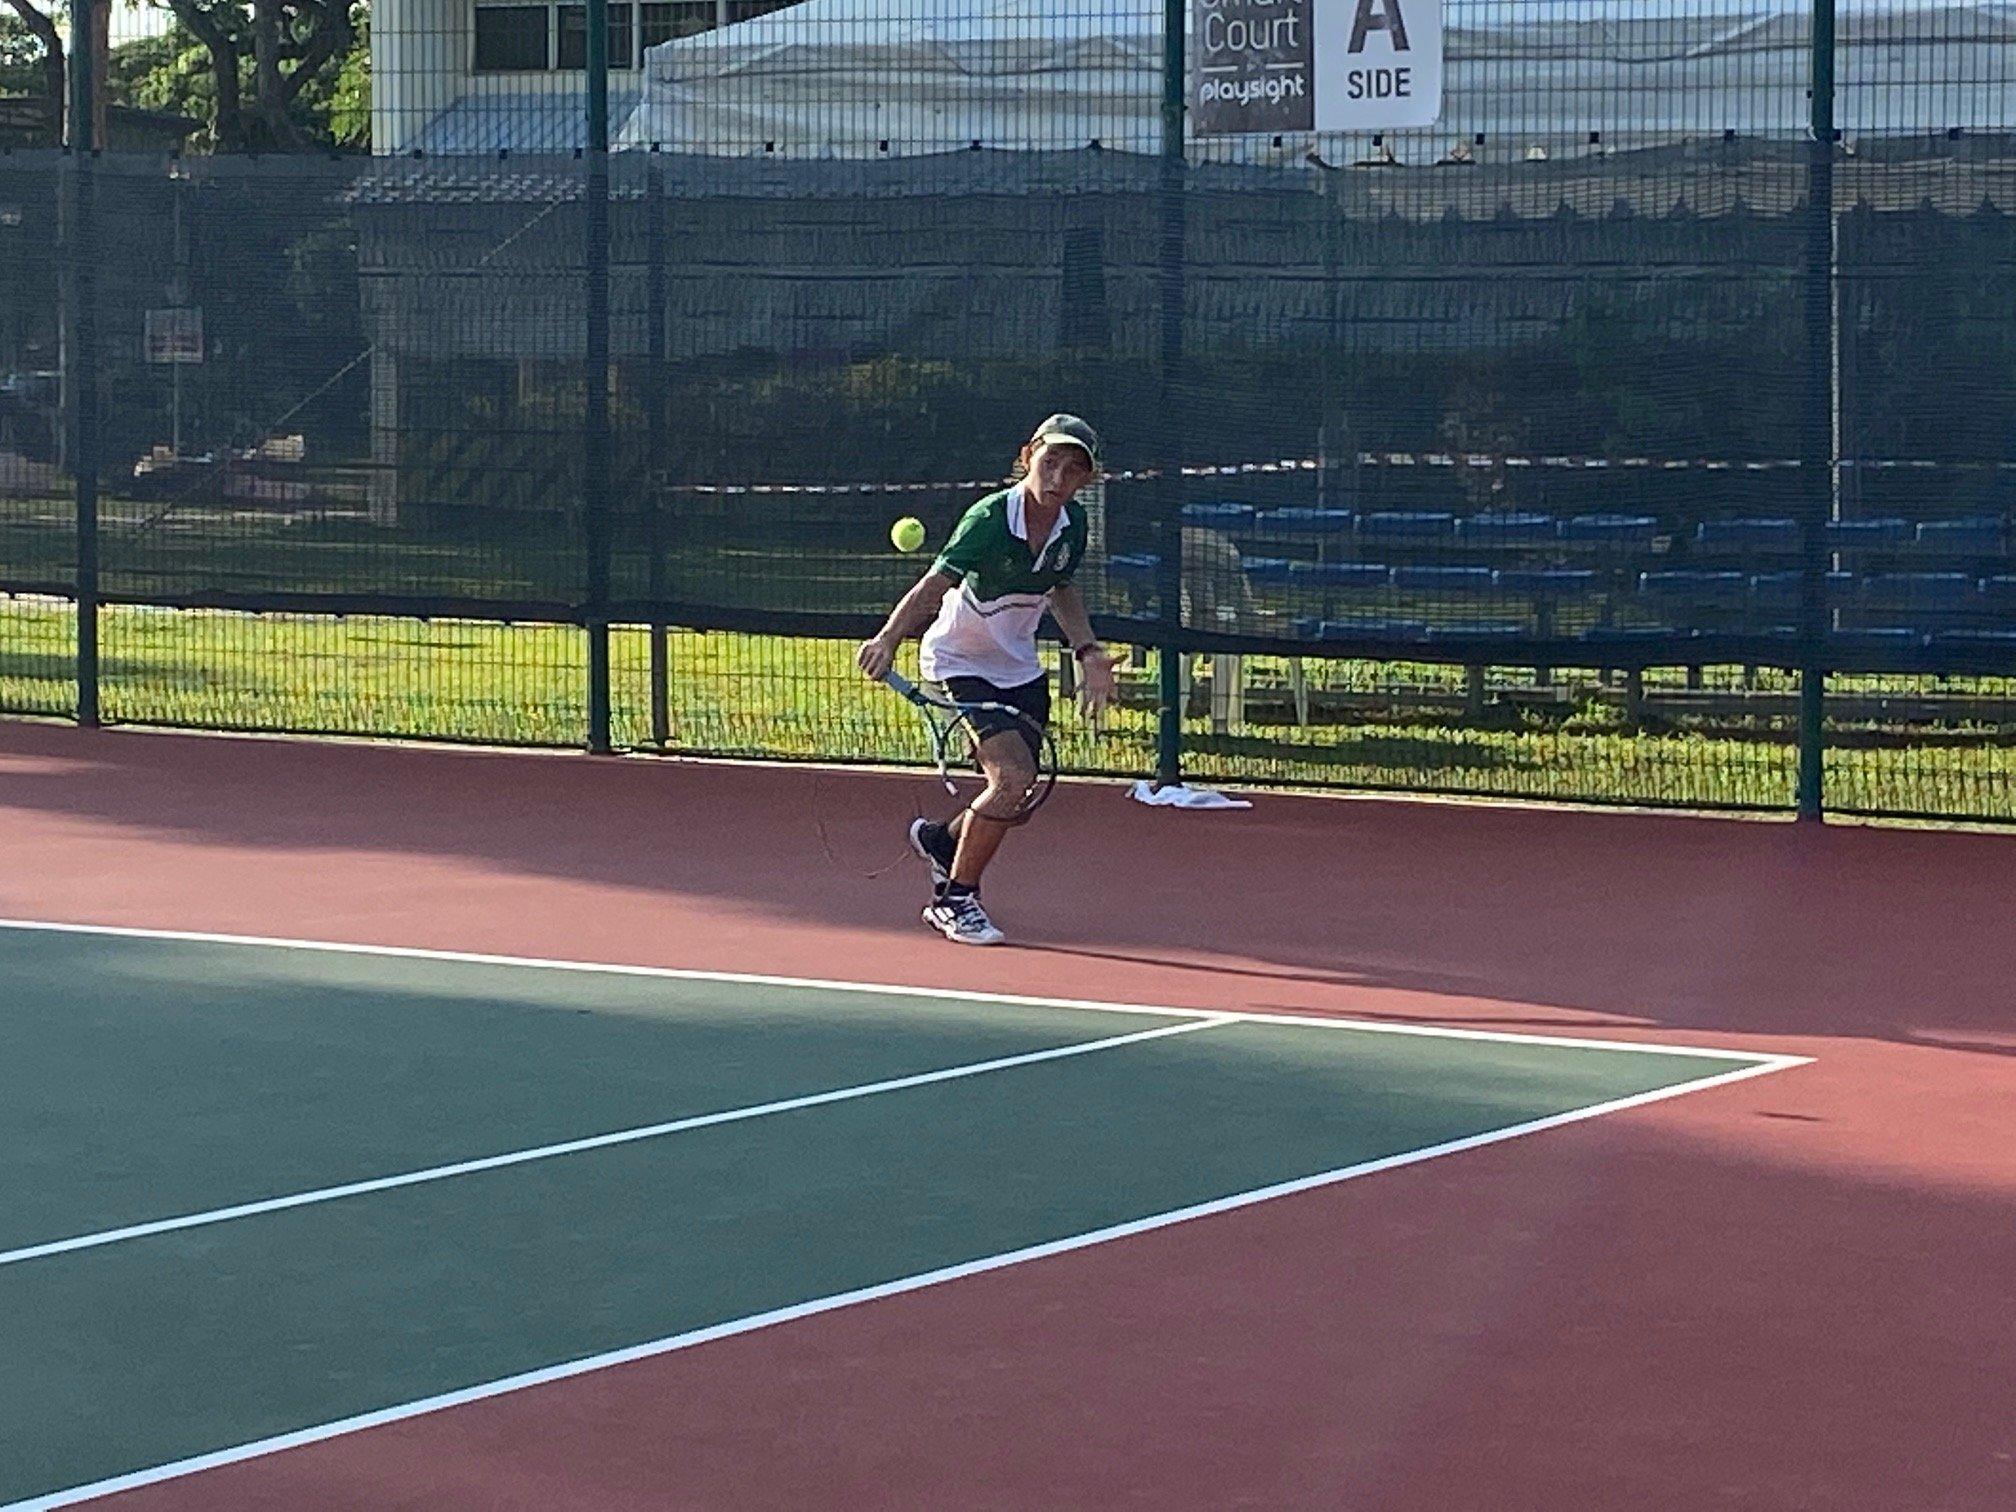 NSG B Division boys' tennis Victoria vs SJI 1st singles 3